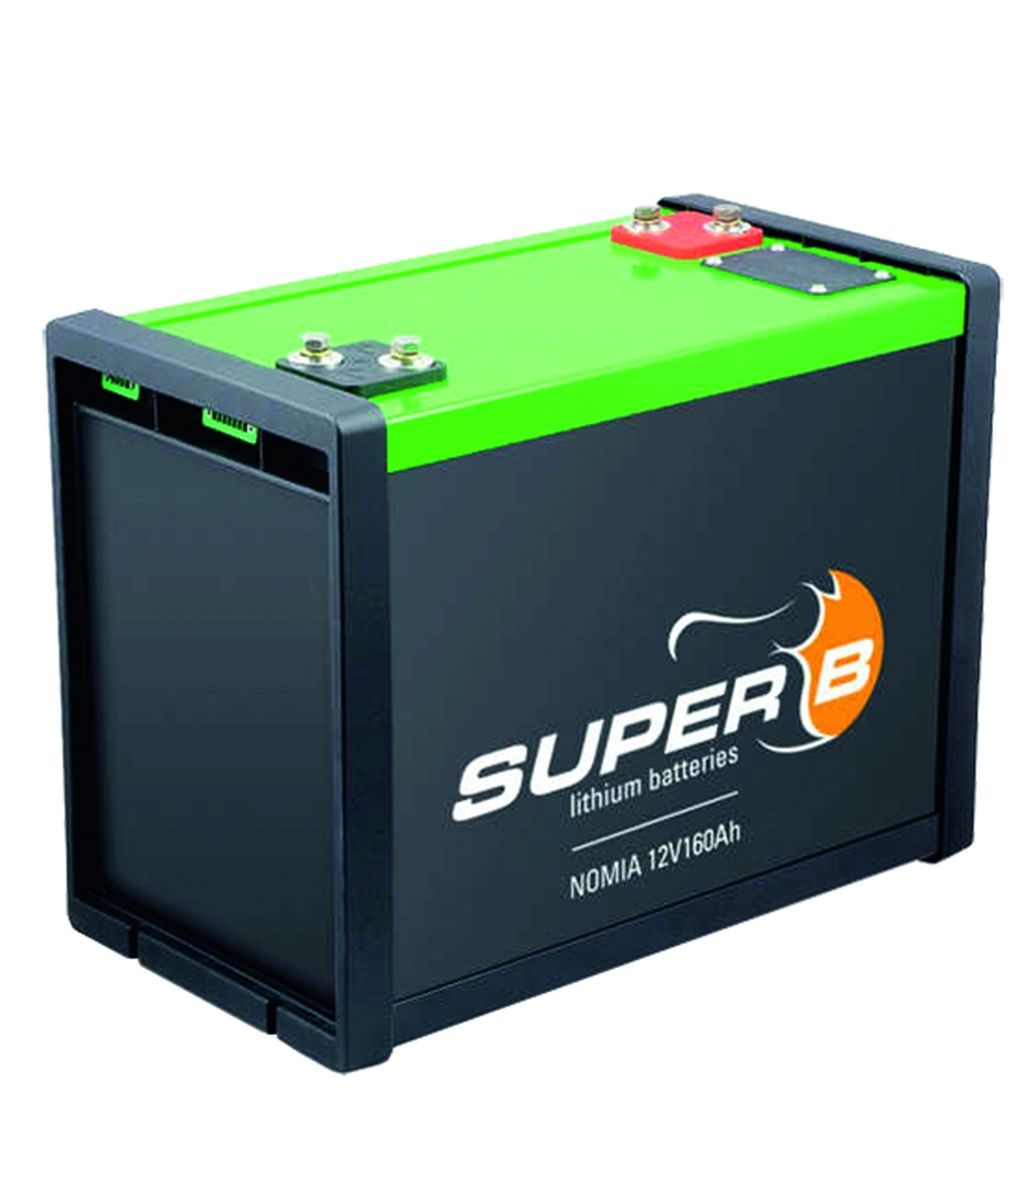 Super B NOMIA 160